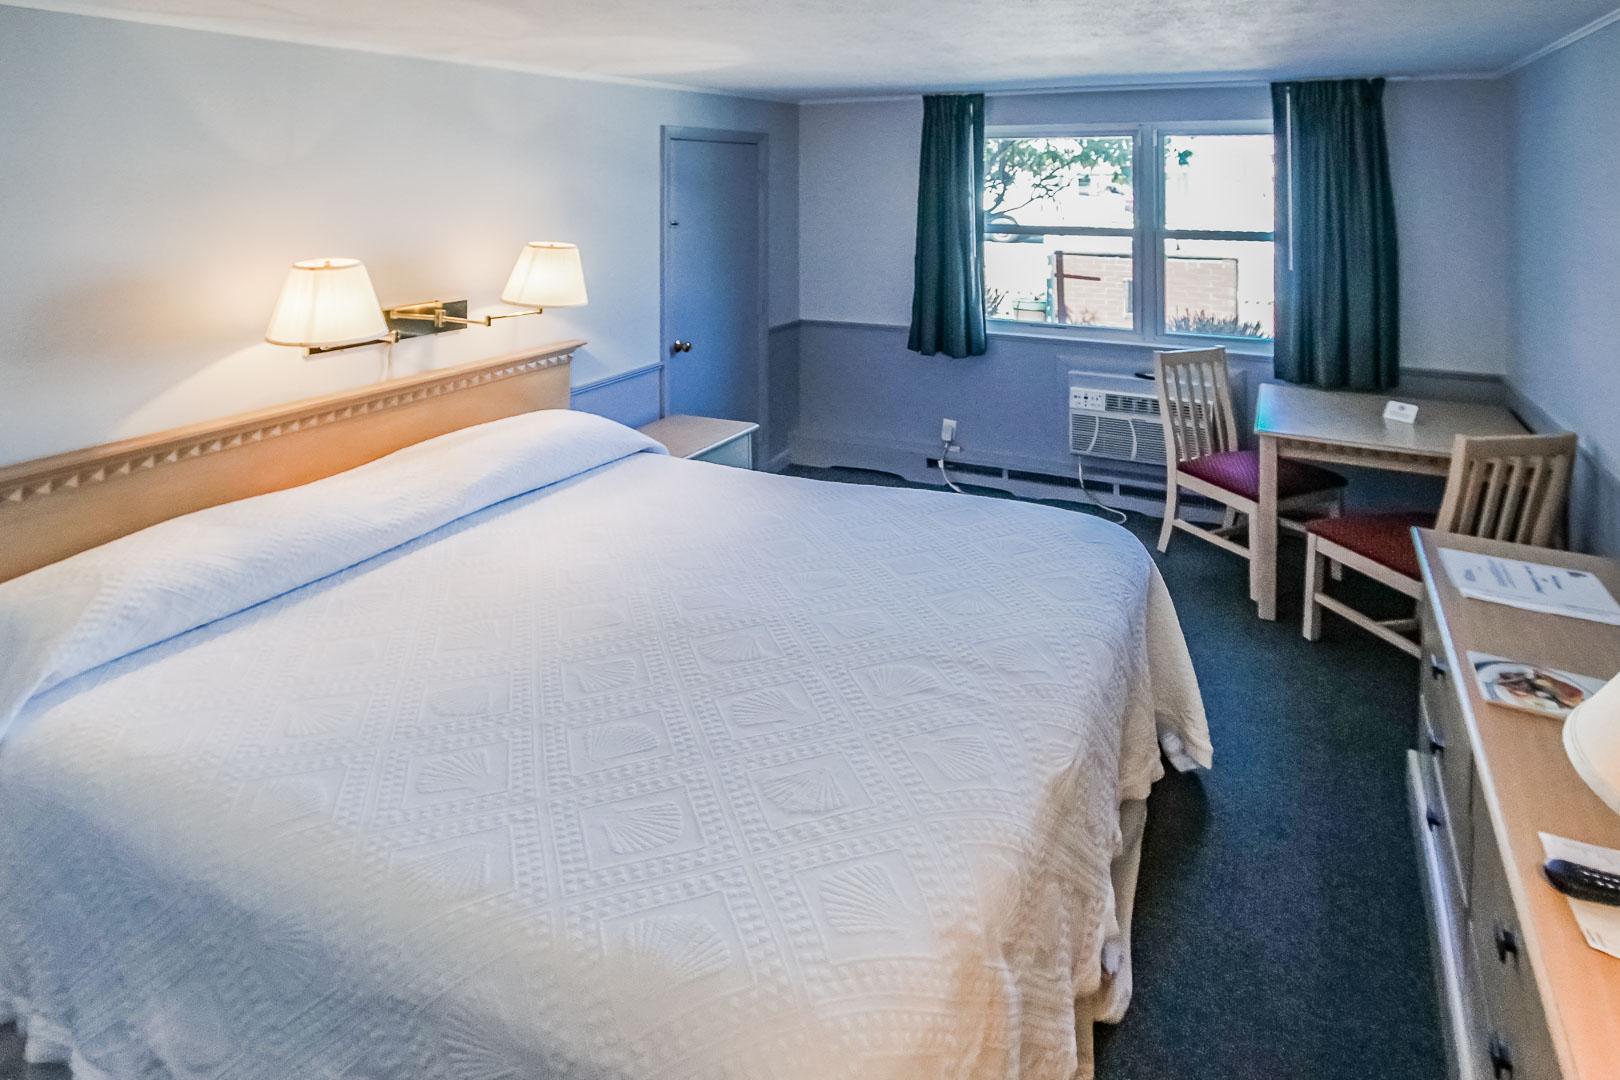 A cozy unit at VRI's Harbor Landing Resort in Massachusetts.